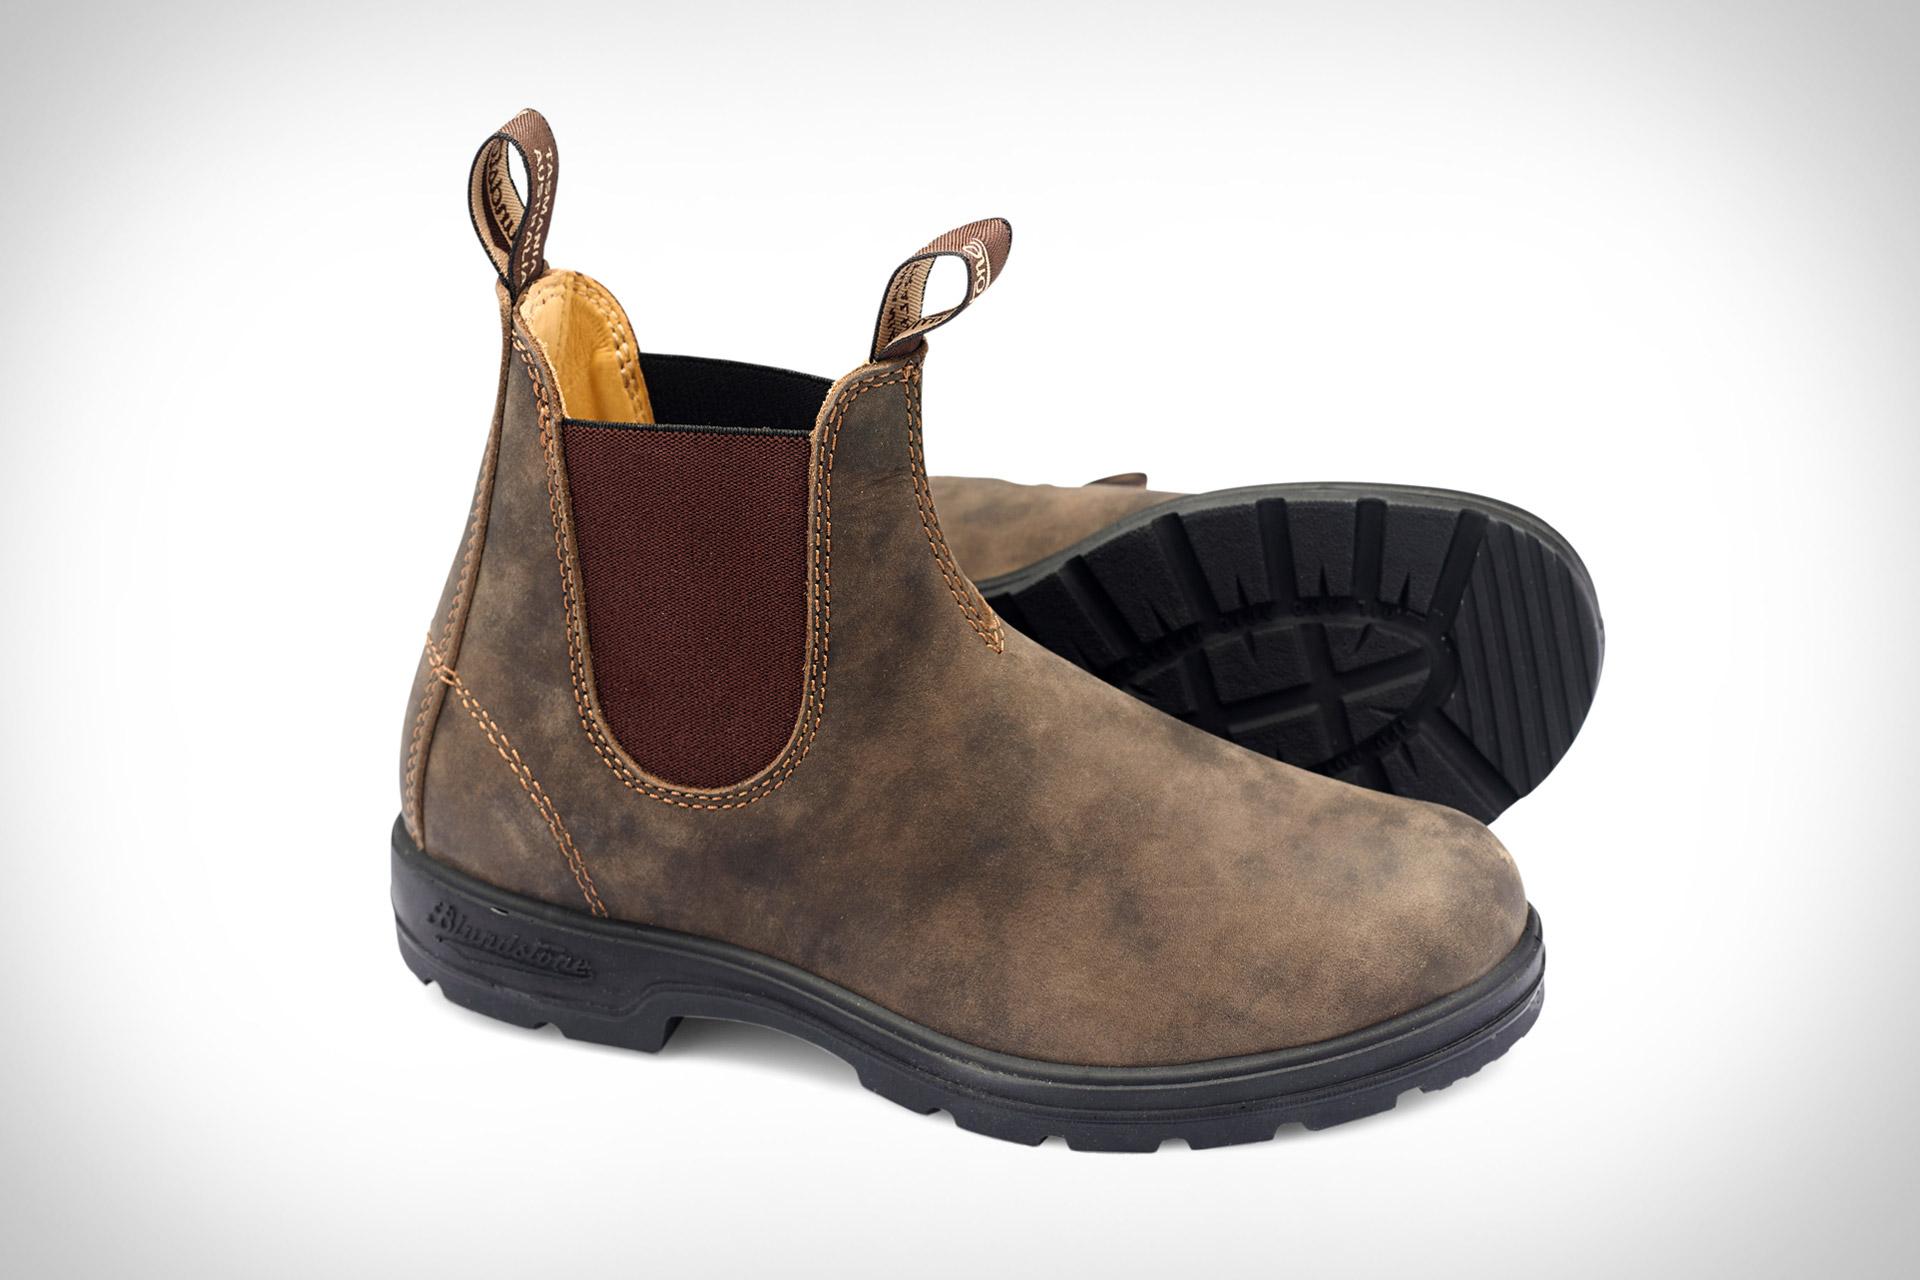 Blundstone 585 Boot